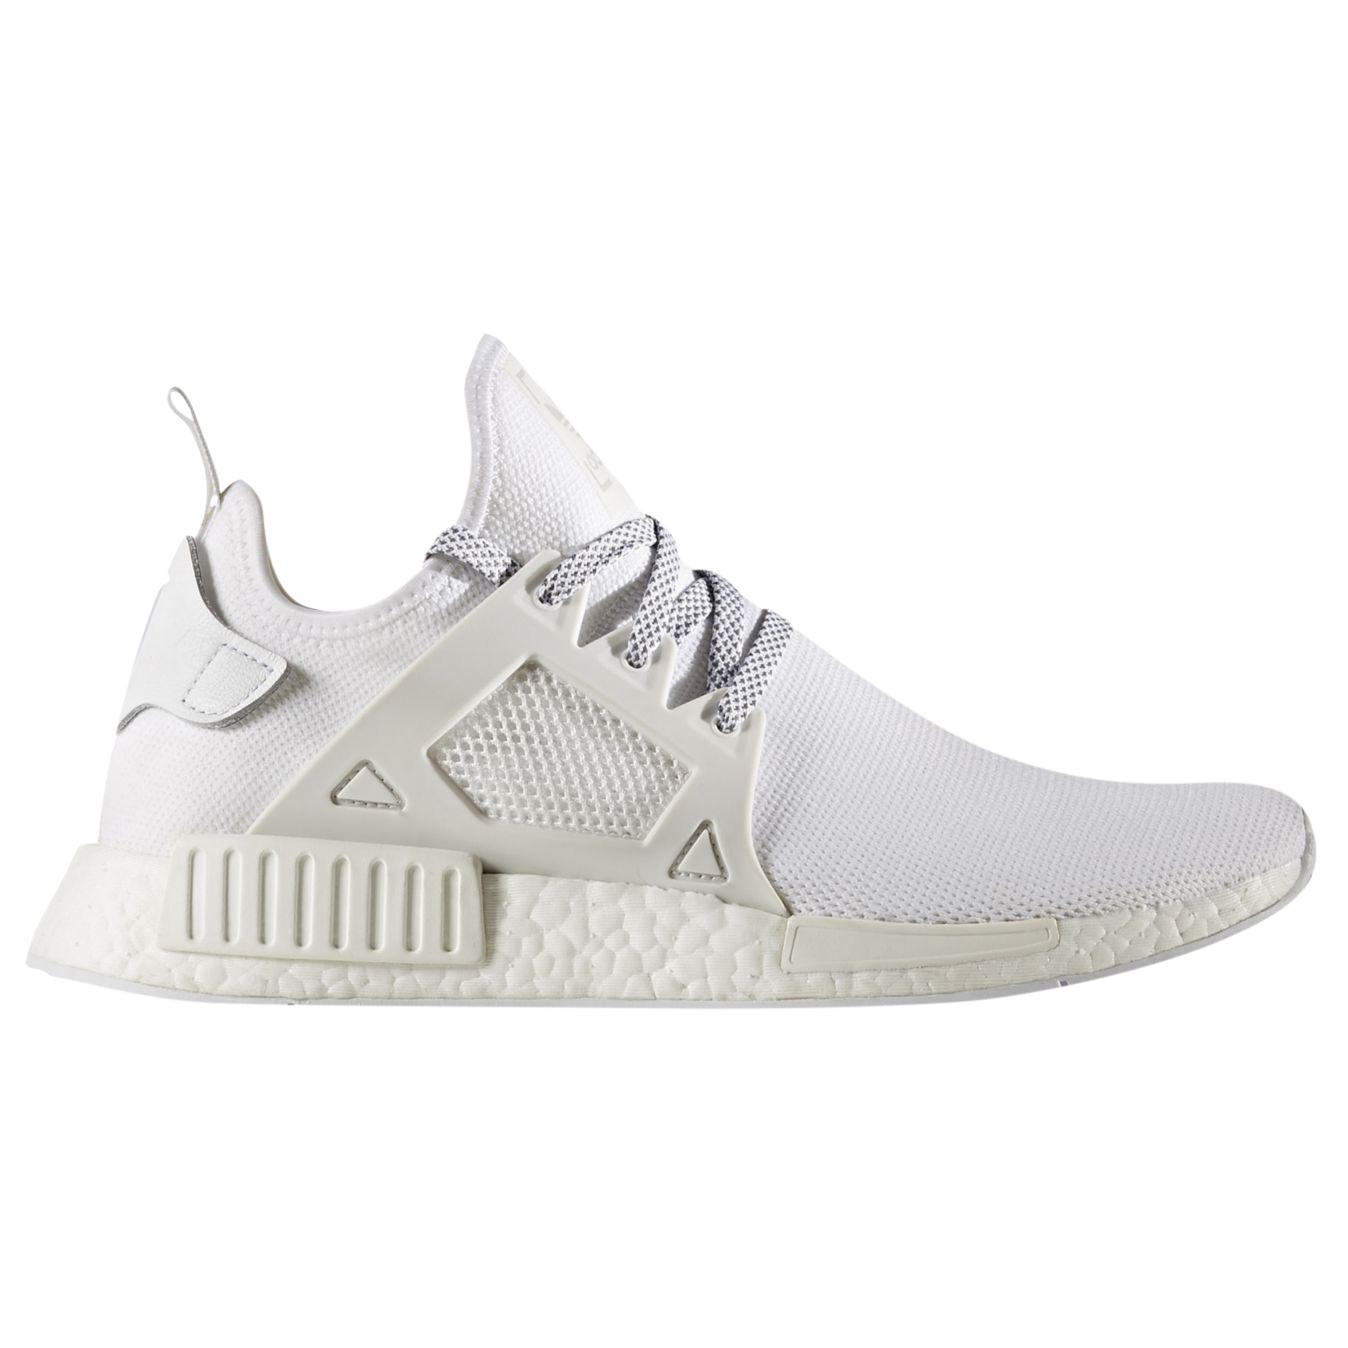 adidas nmd triple white OFF60% pect.se!